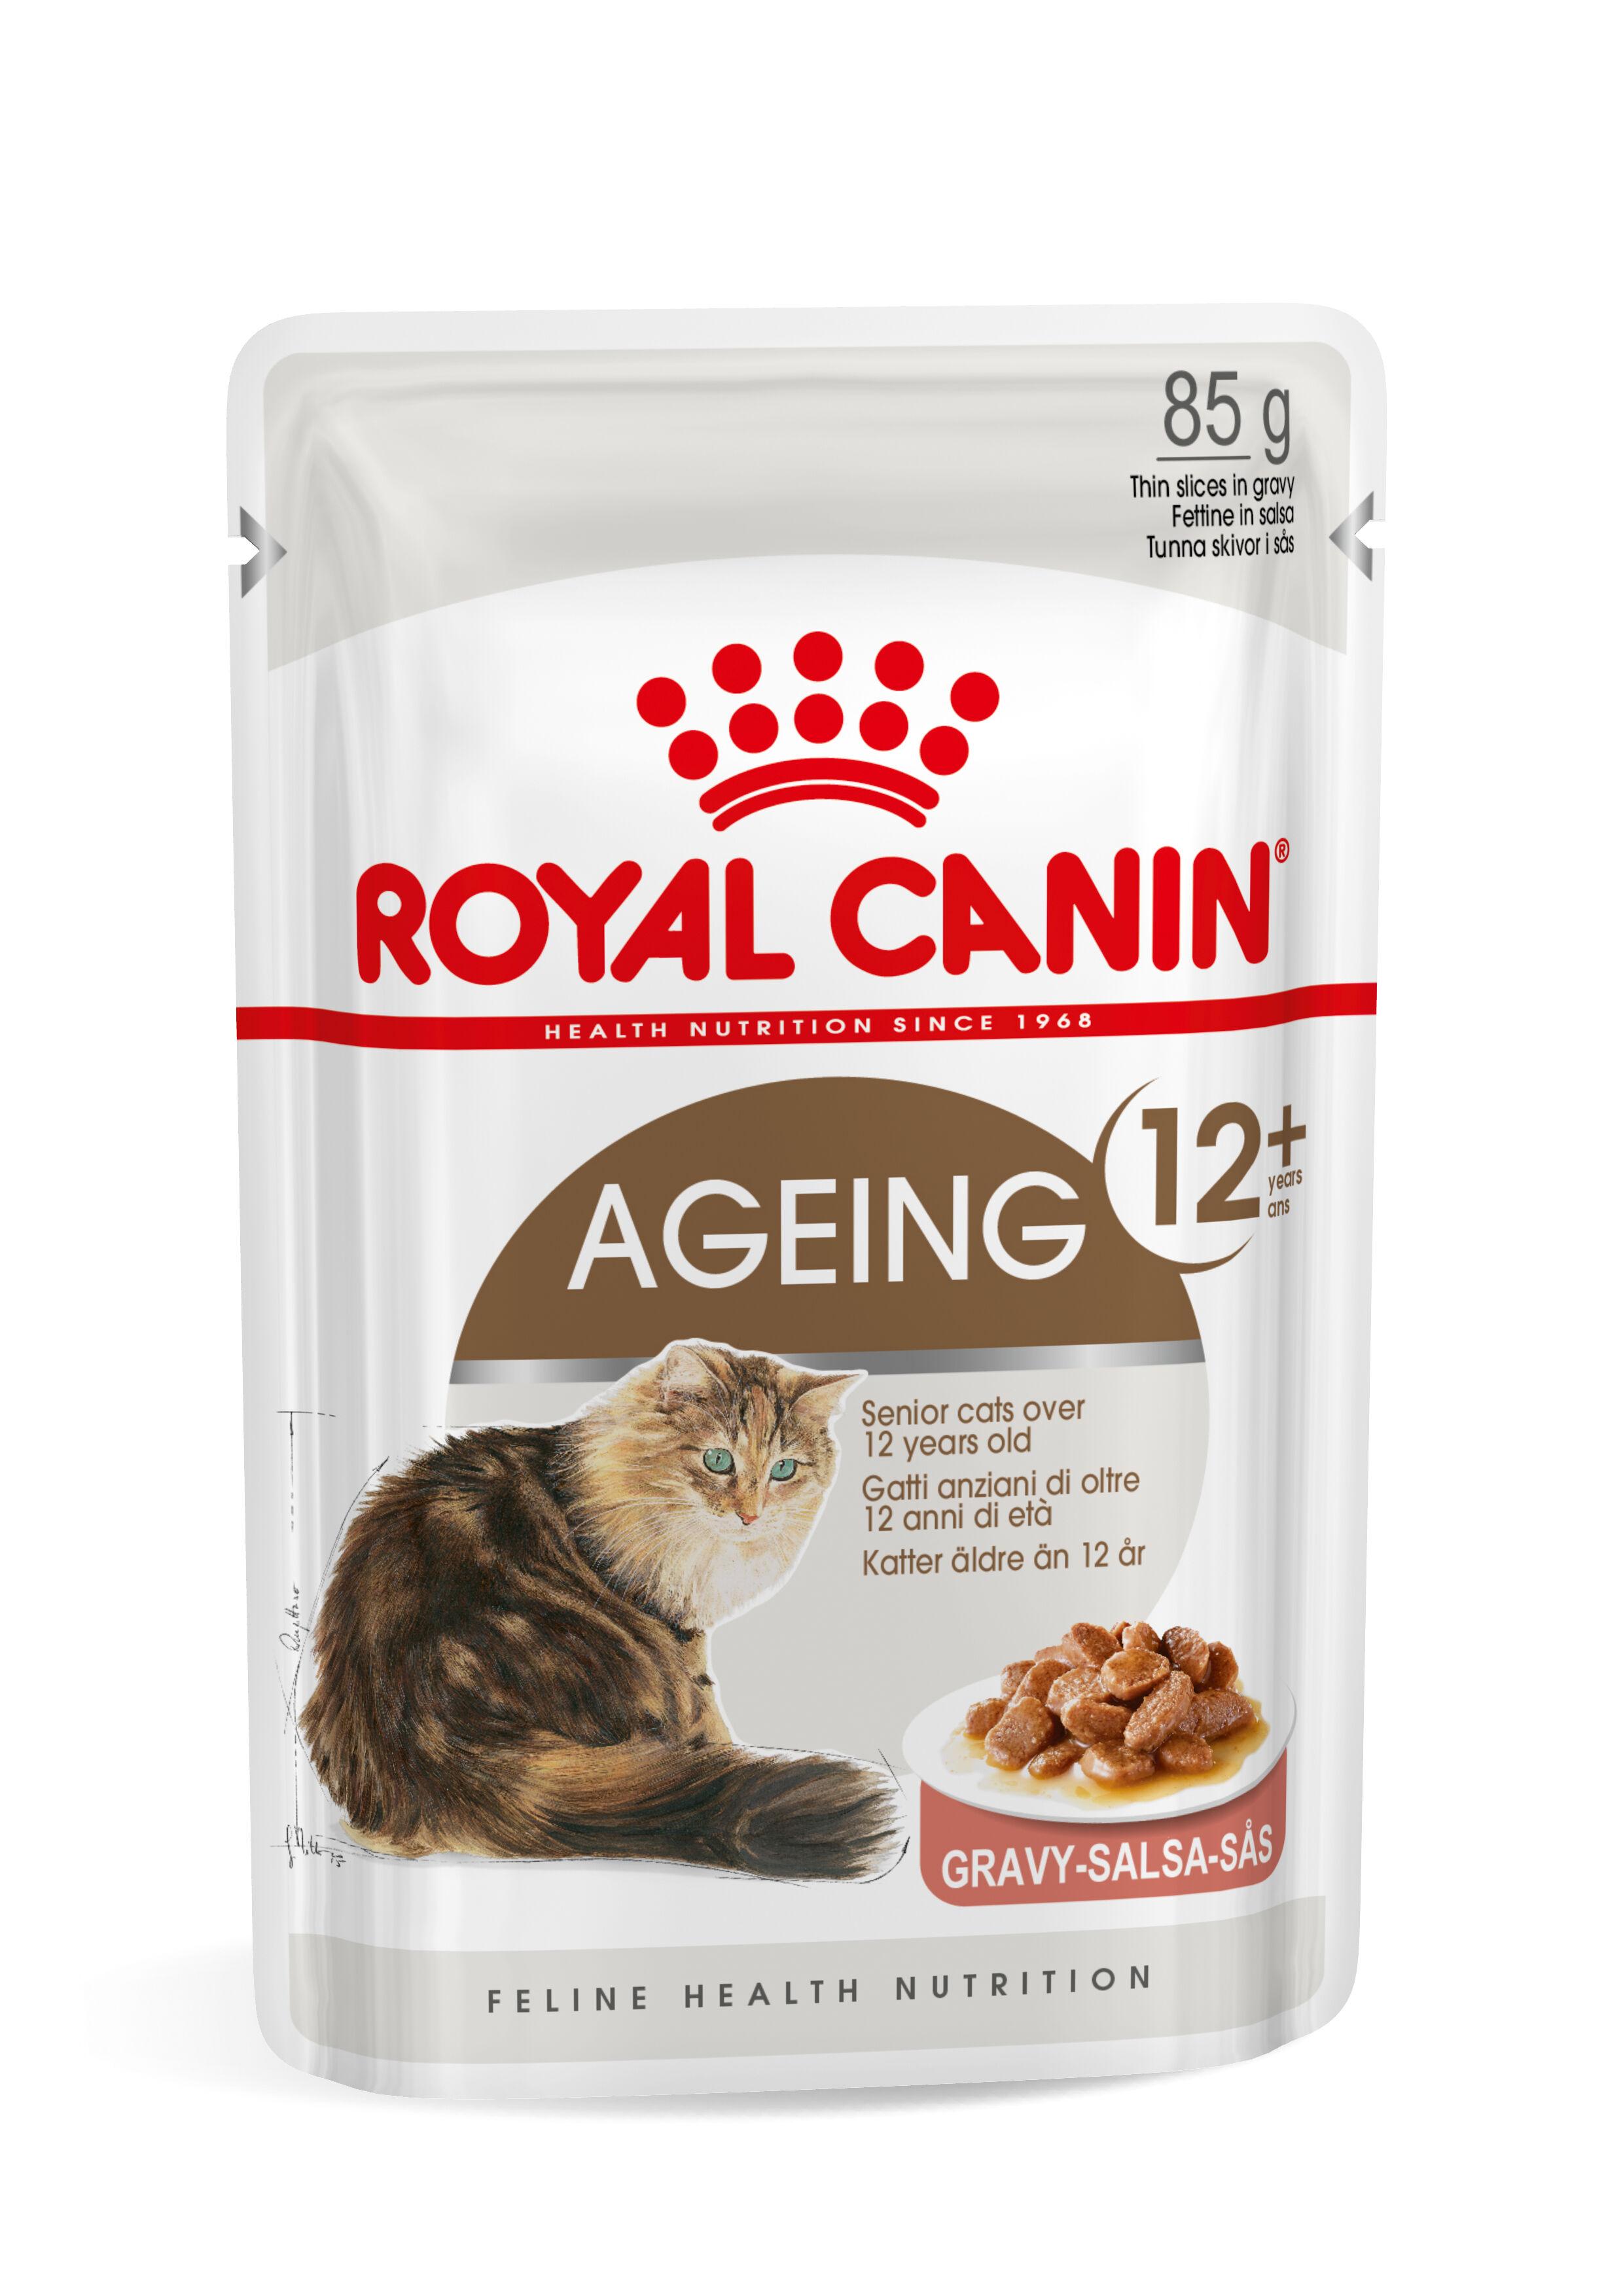 Royal Canin Ageing 12+ pour chat x12 sachets 4x En Sauce (48x85 gr)